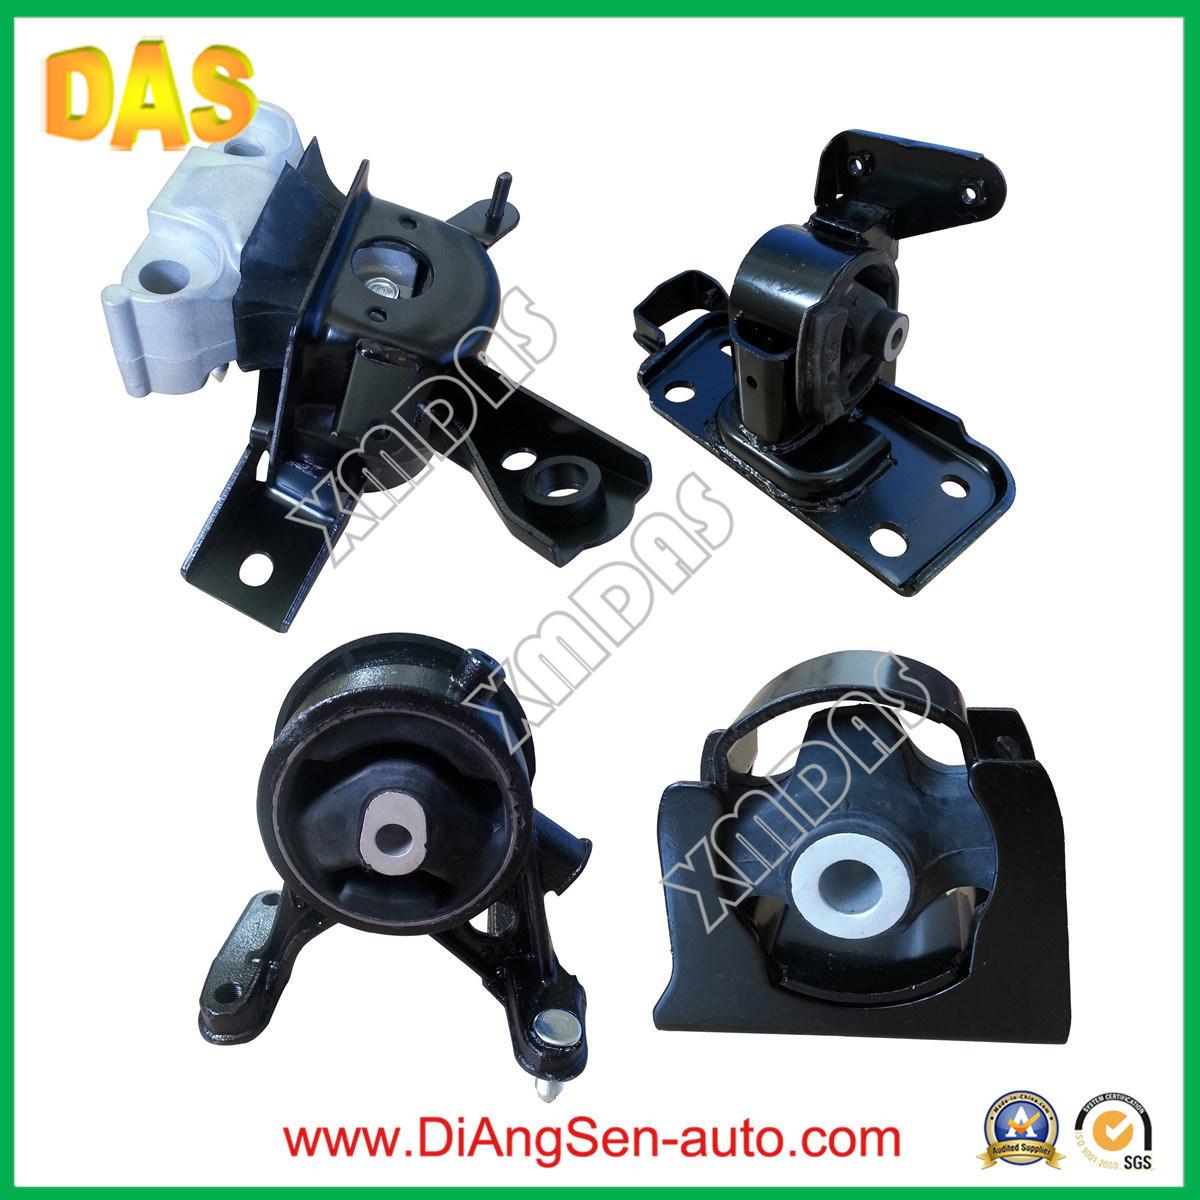 Aftermarket Car Parts - Rubber Engine Motor Mounting for Honda / Toyota / Nissan / Mazda / Mitsubishi / Suzuki / Subaru